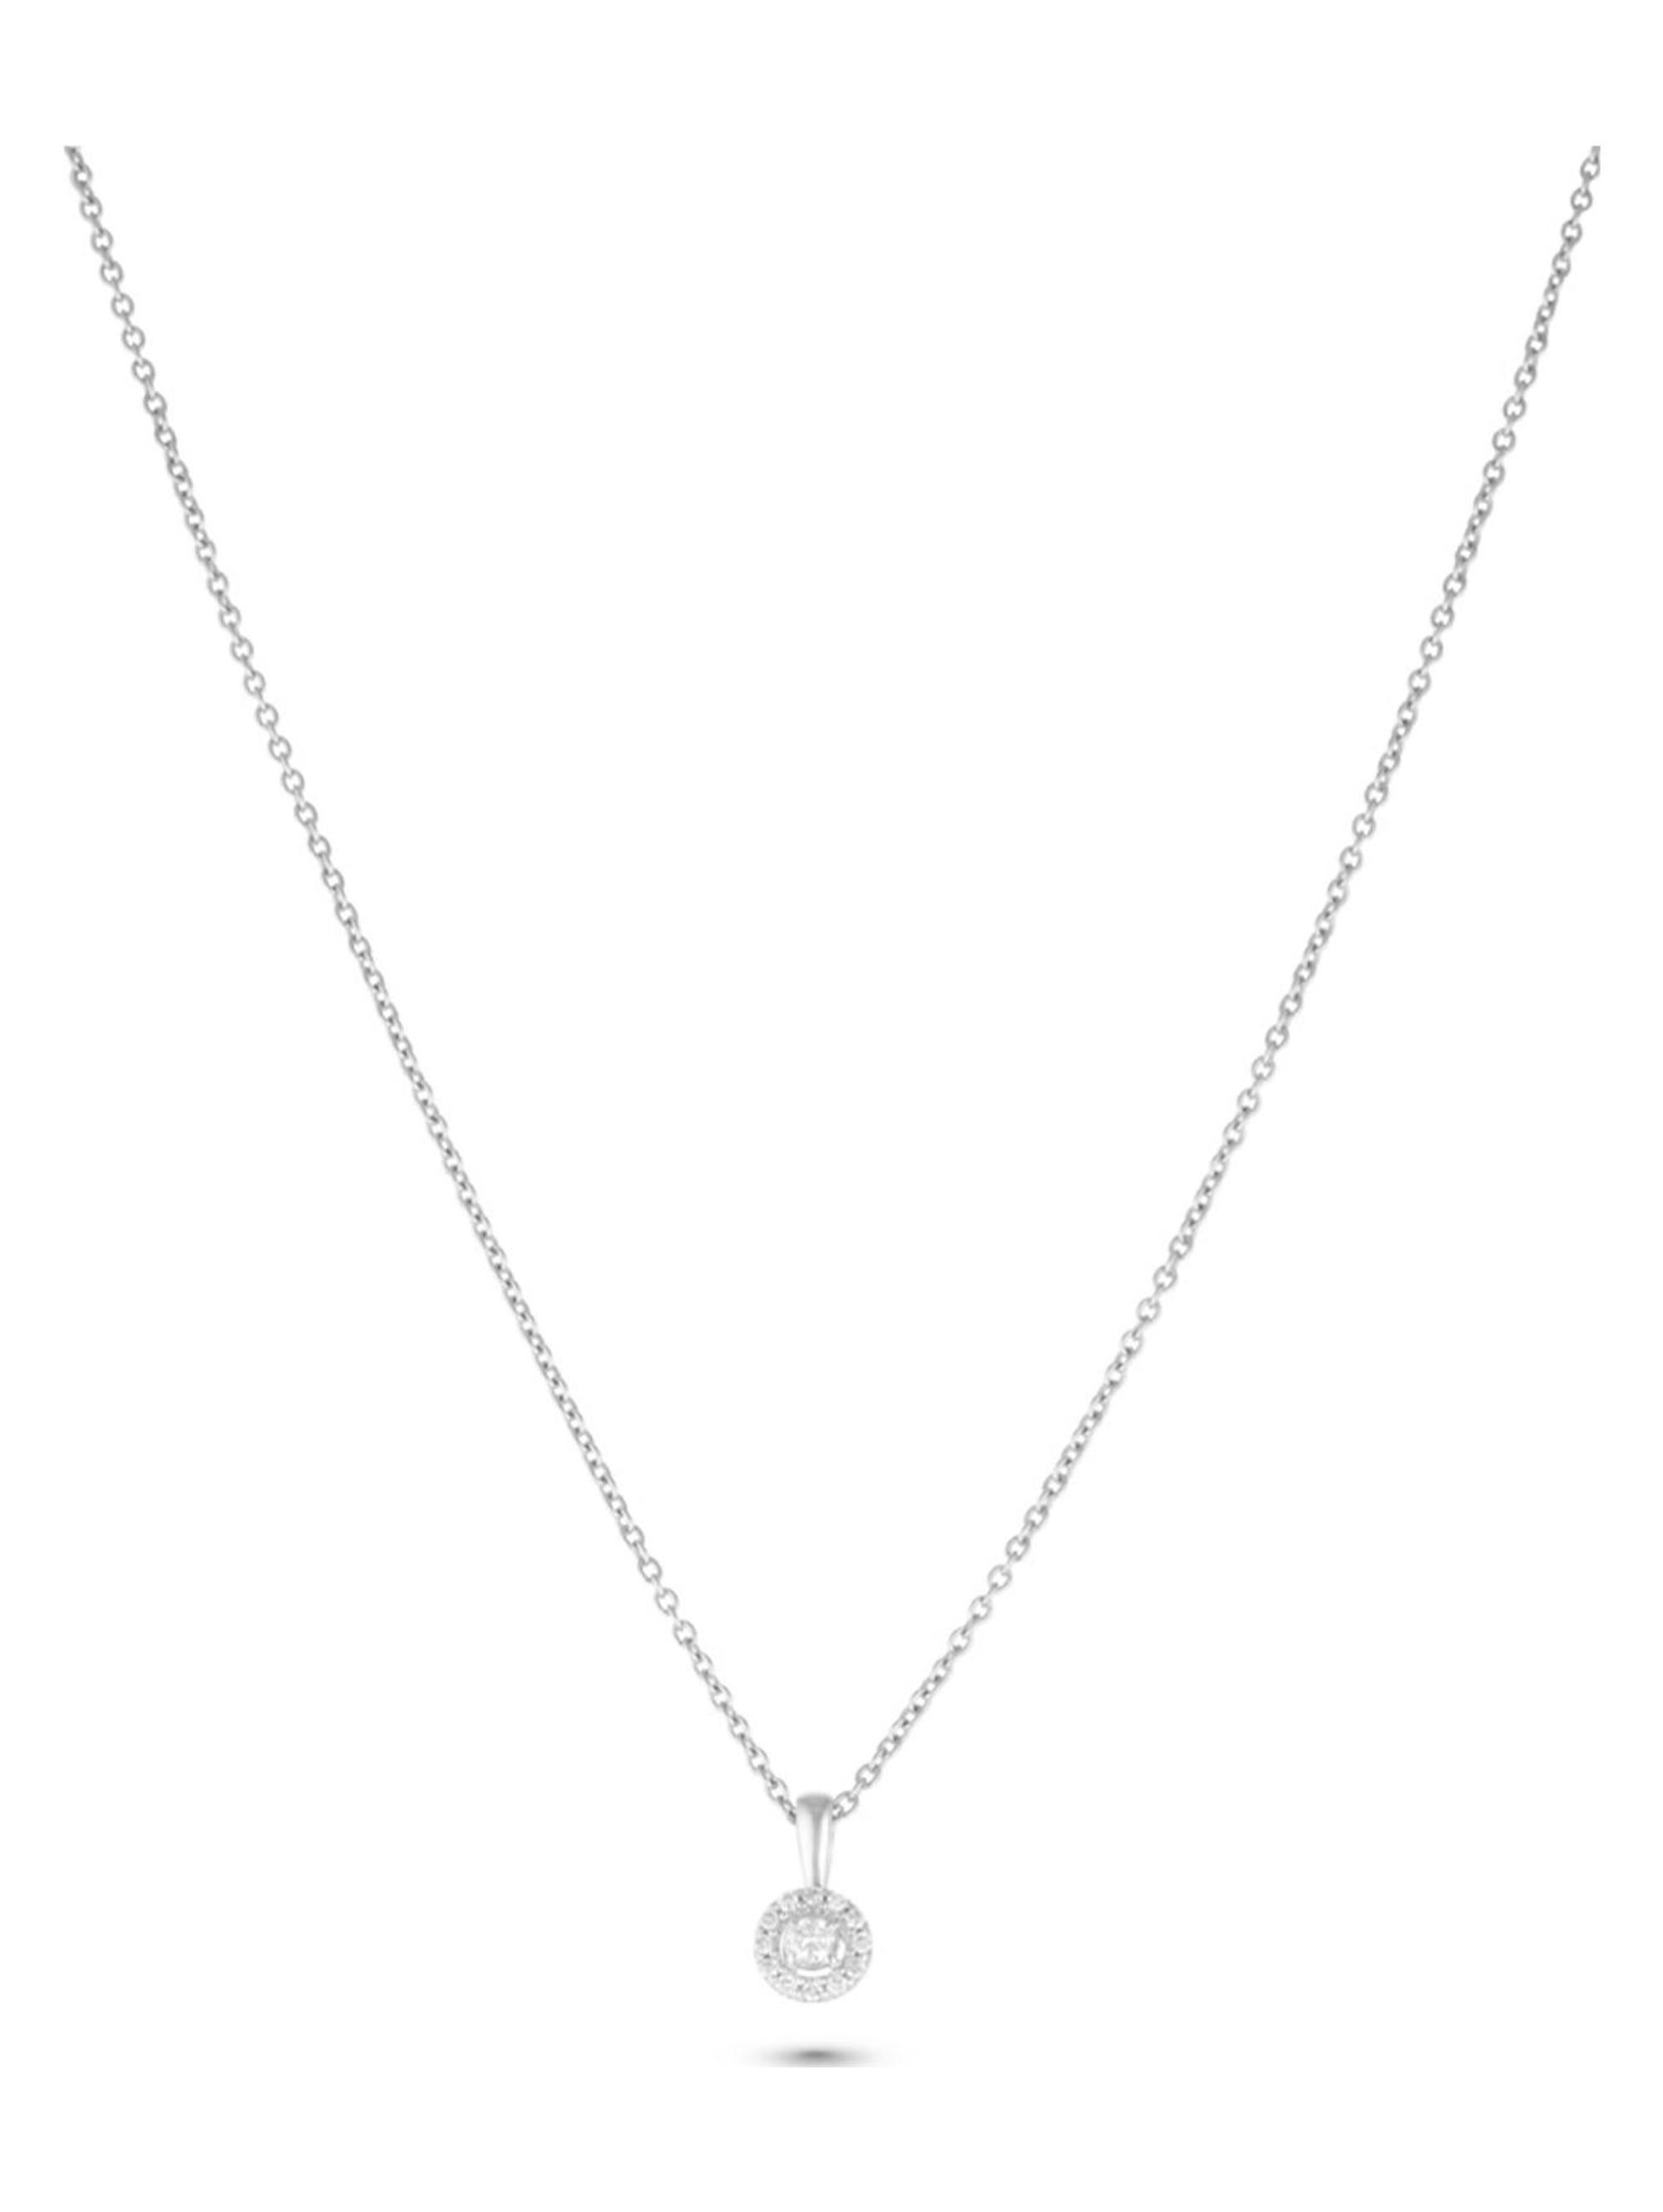 CHRIST Diamonds CHRIST Diamonds Damen-Kette 375er Weißgold 13 Diamant rYWMO